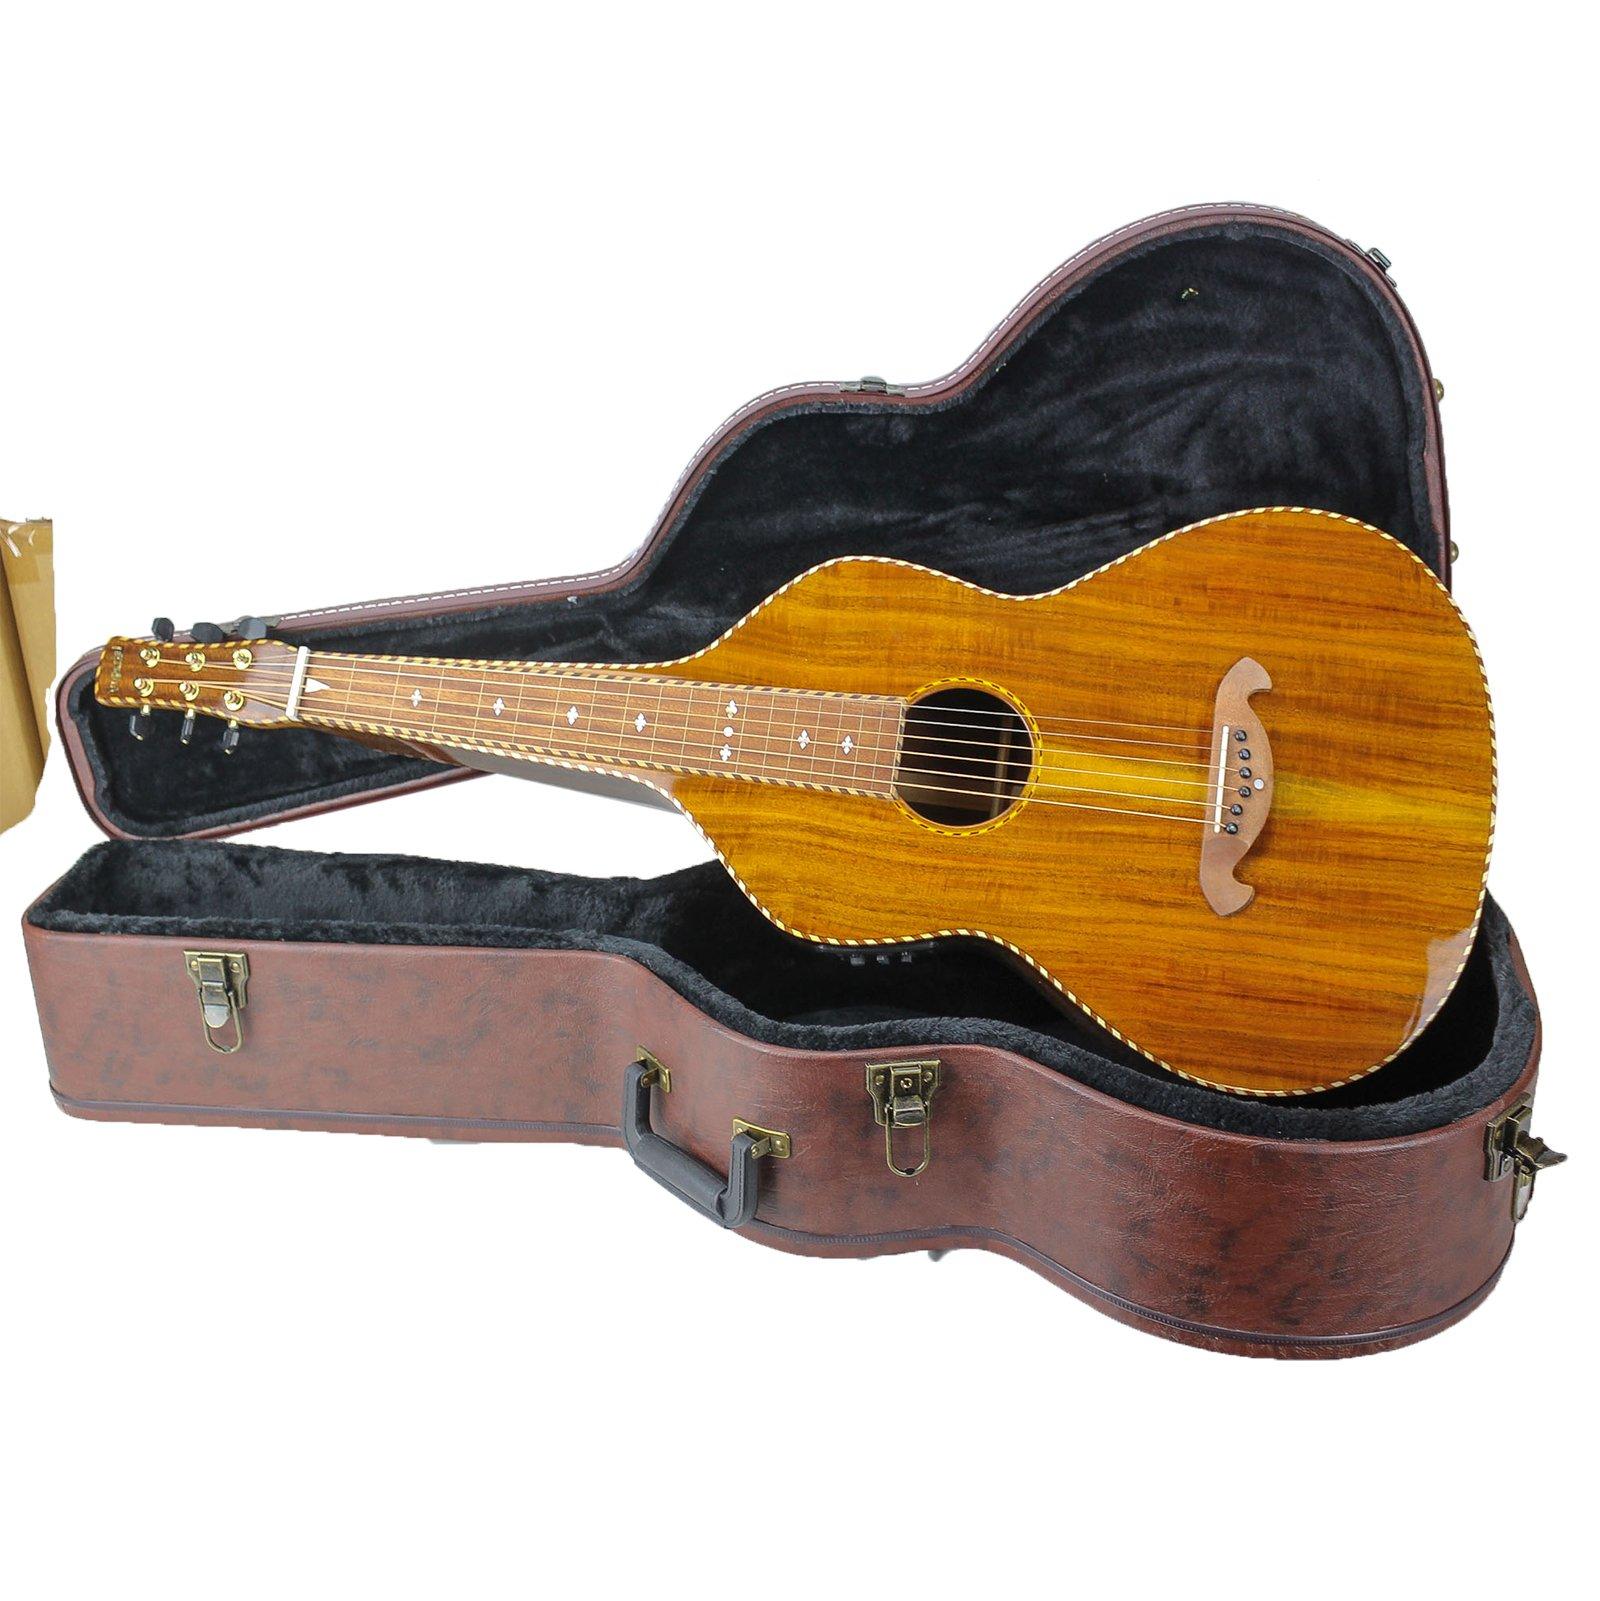 Imperial Royal Hawaiian Koa Kani Extra Deep Weissenborn Style Lap Steel Guitar